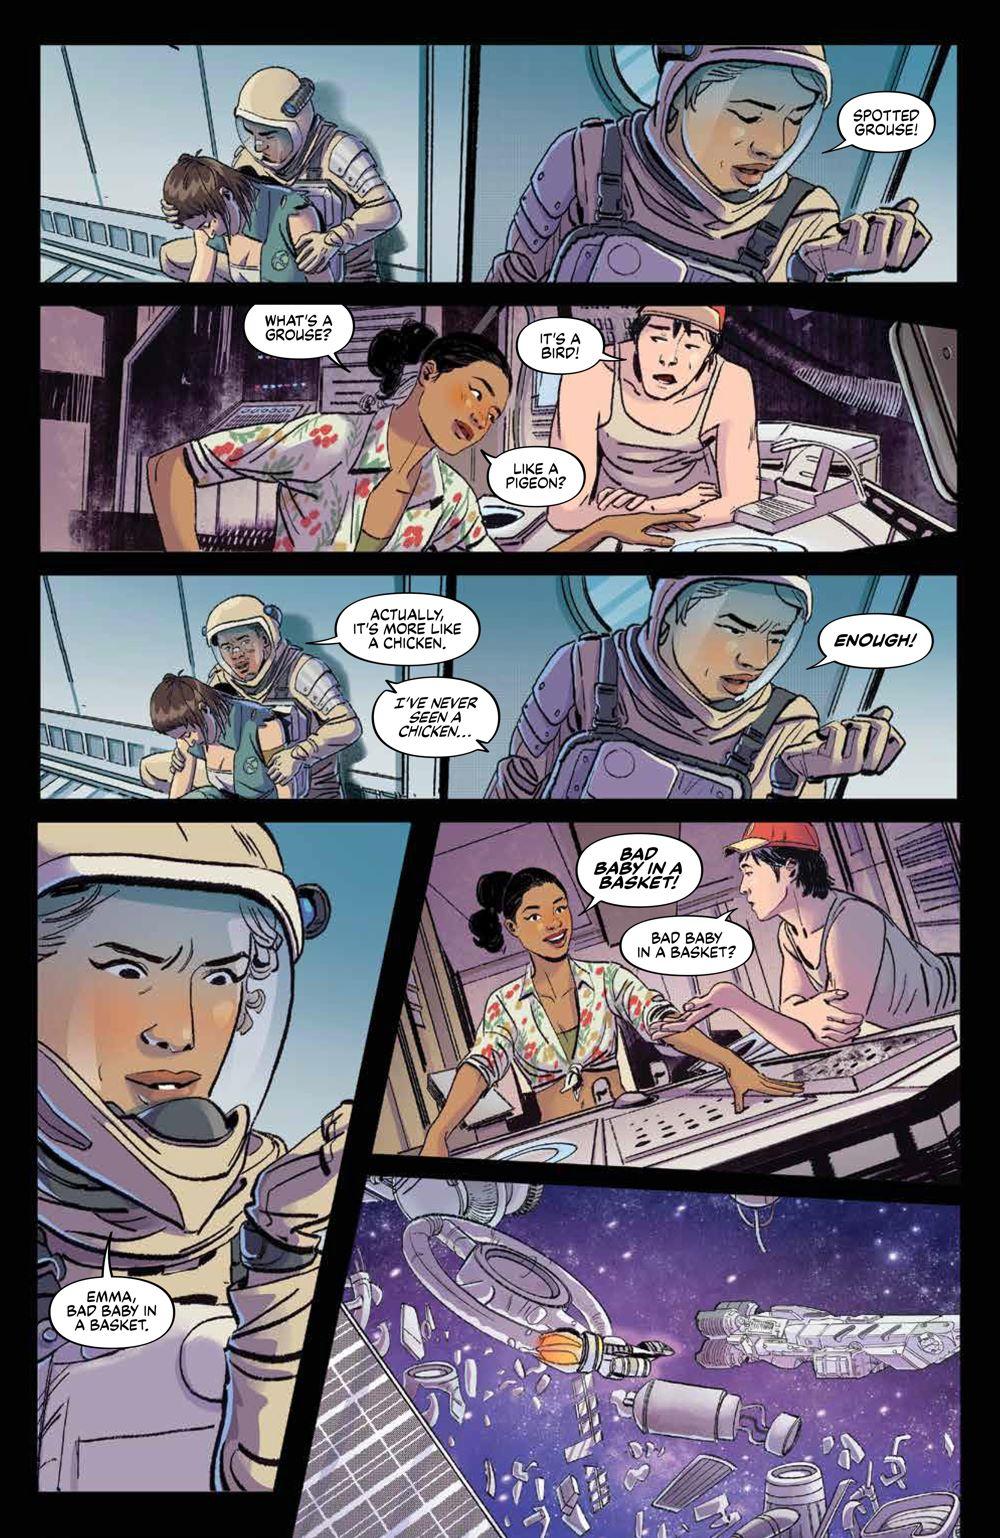 Firefly_BrandNewVerse_002_PRESS_6 ComicList Previews: FIREFLY A BRAND NEW 'VERSE #2 (OF 6)